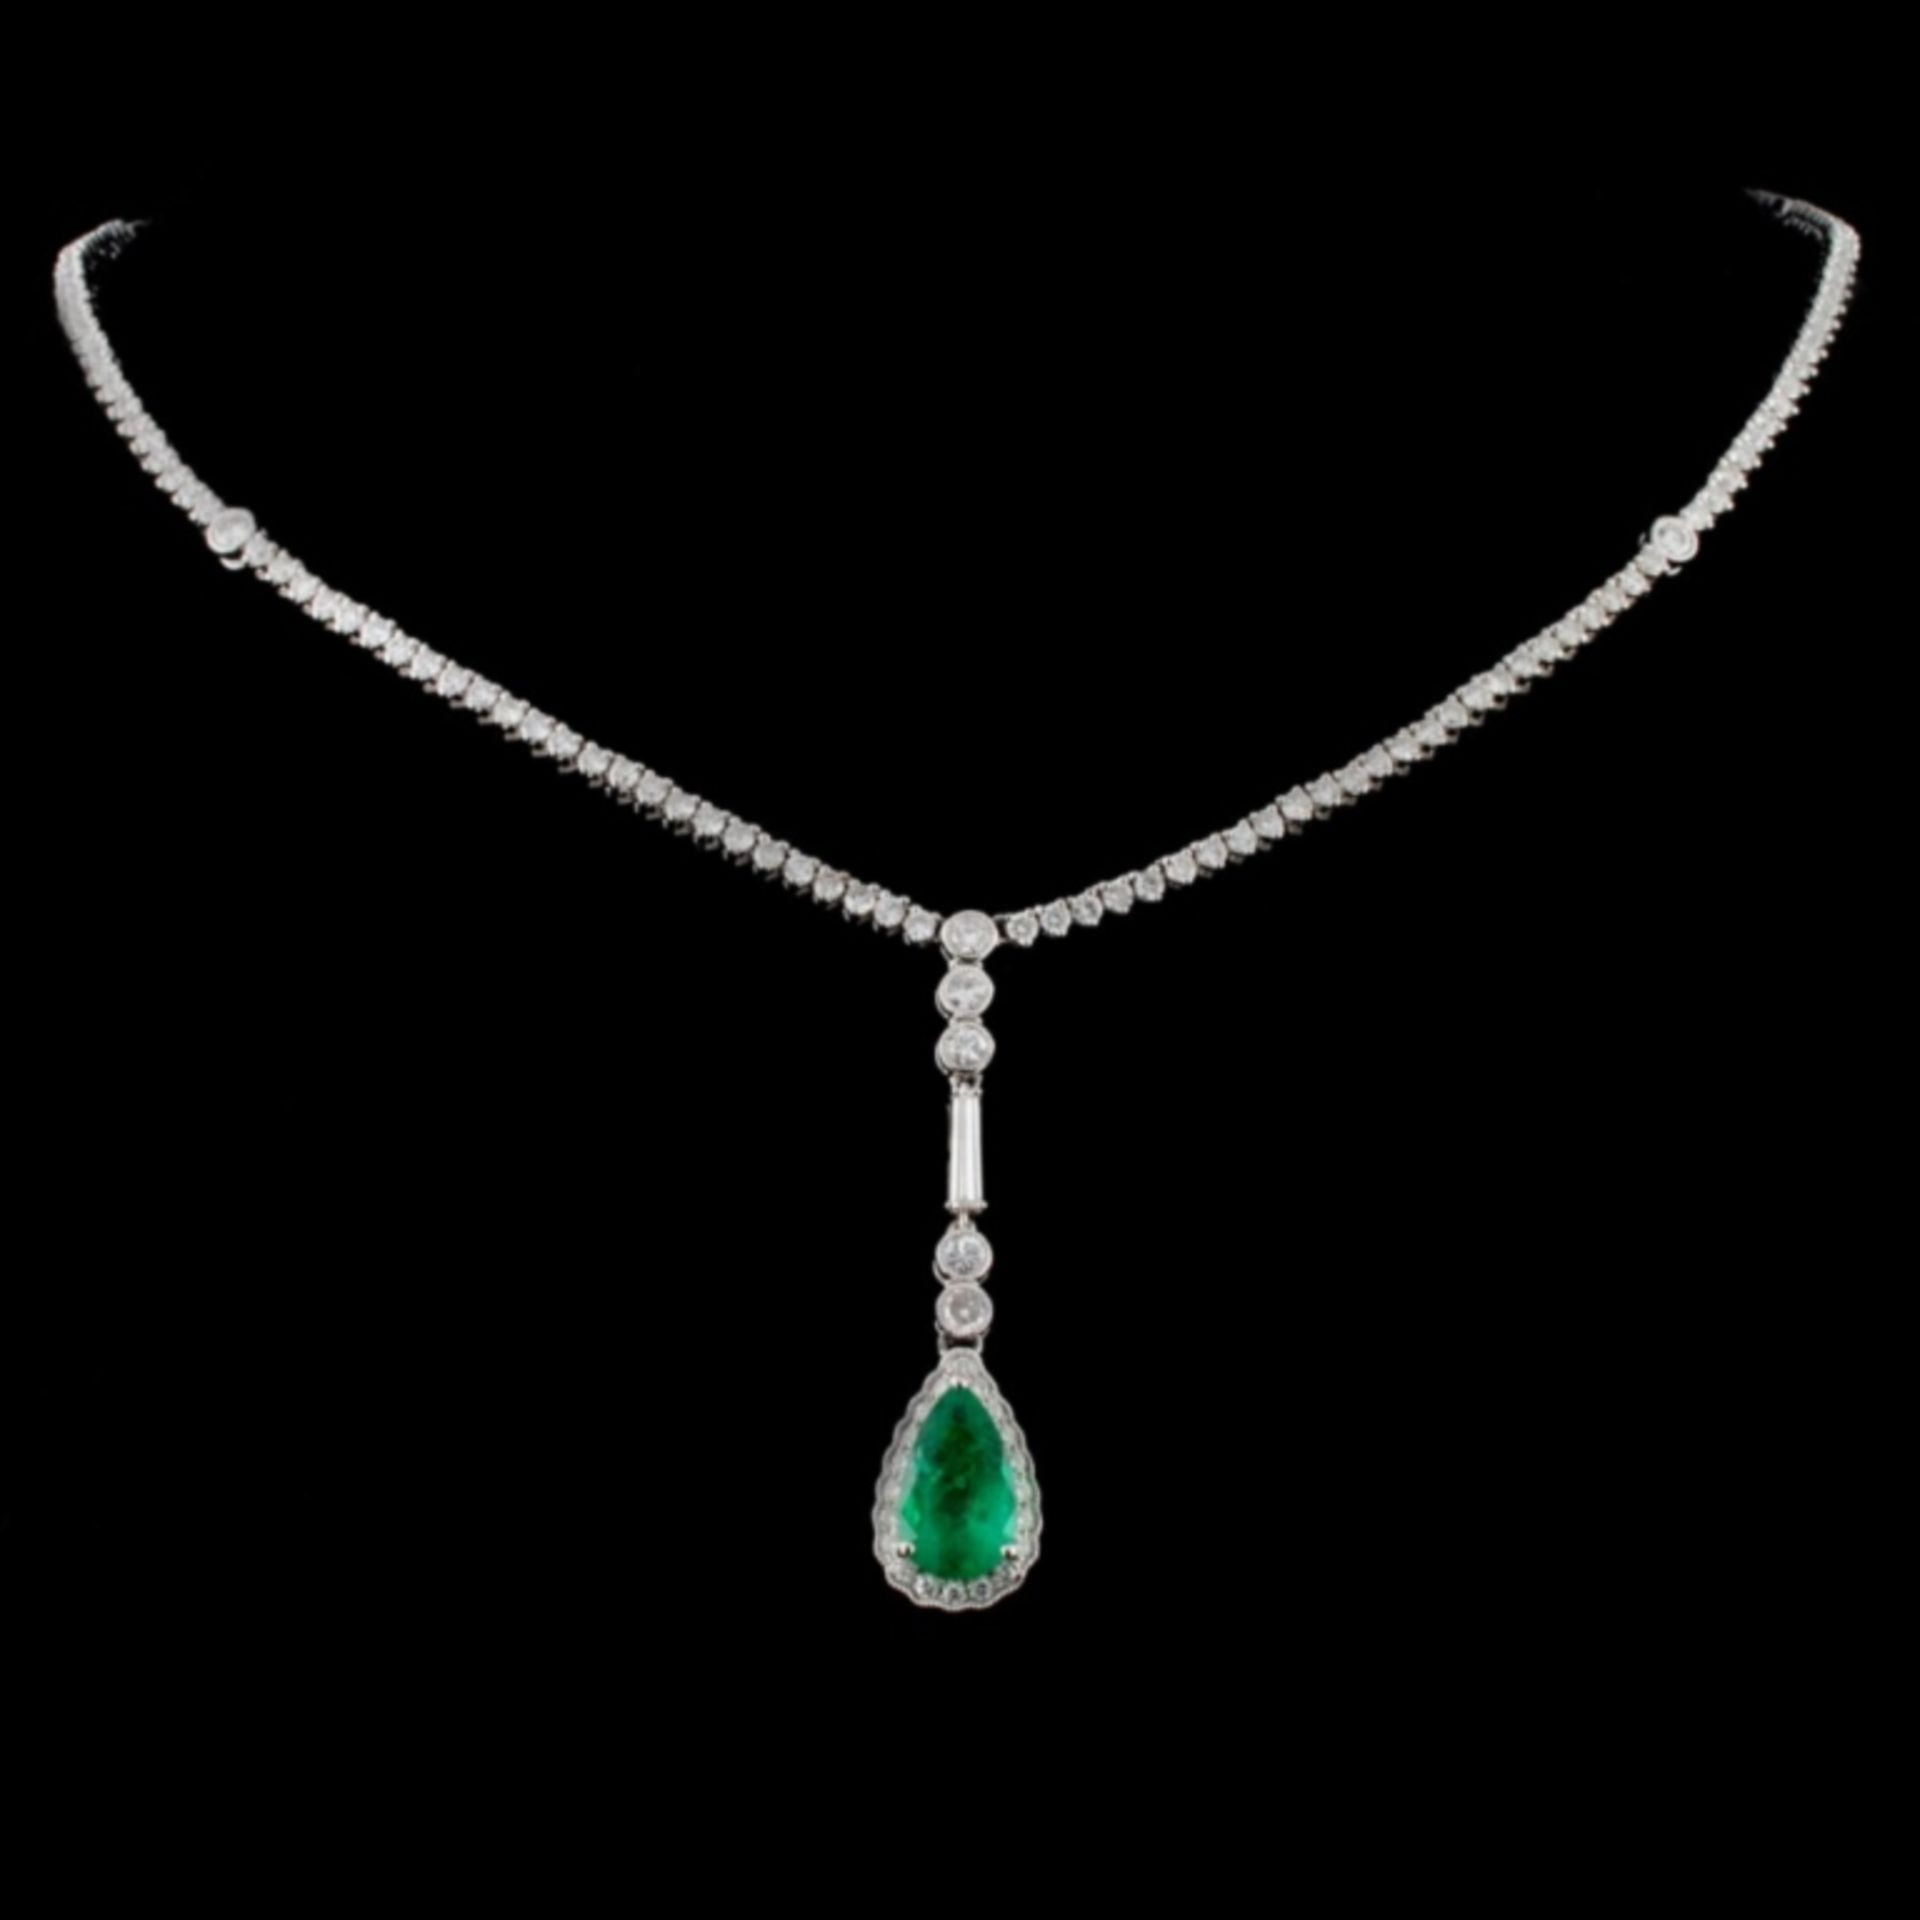 18K White Gold 1.81ct Emerald & 4.15ct Diamond Nec - Image 2 of 3